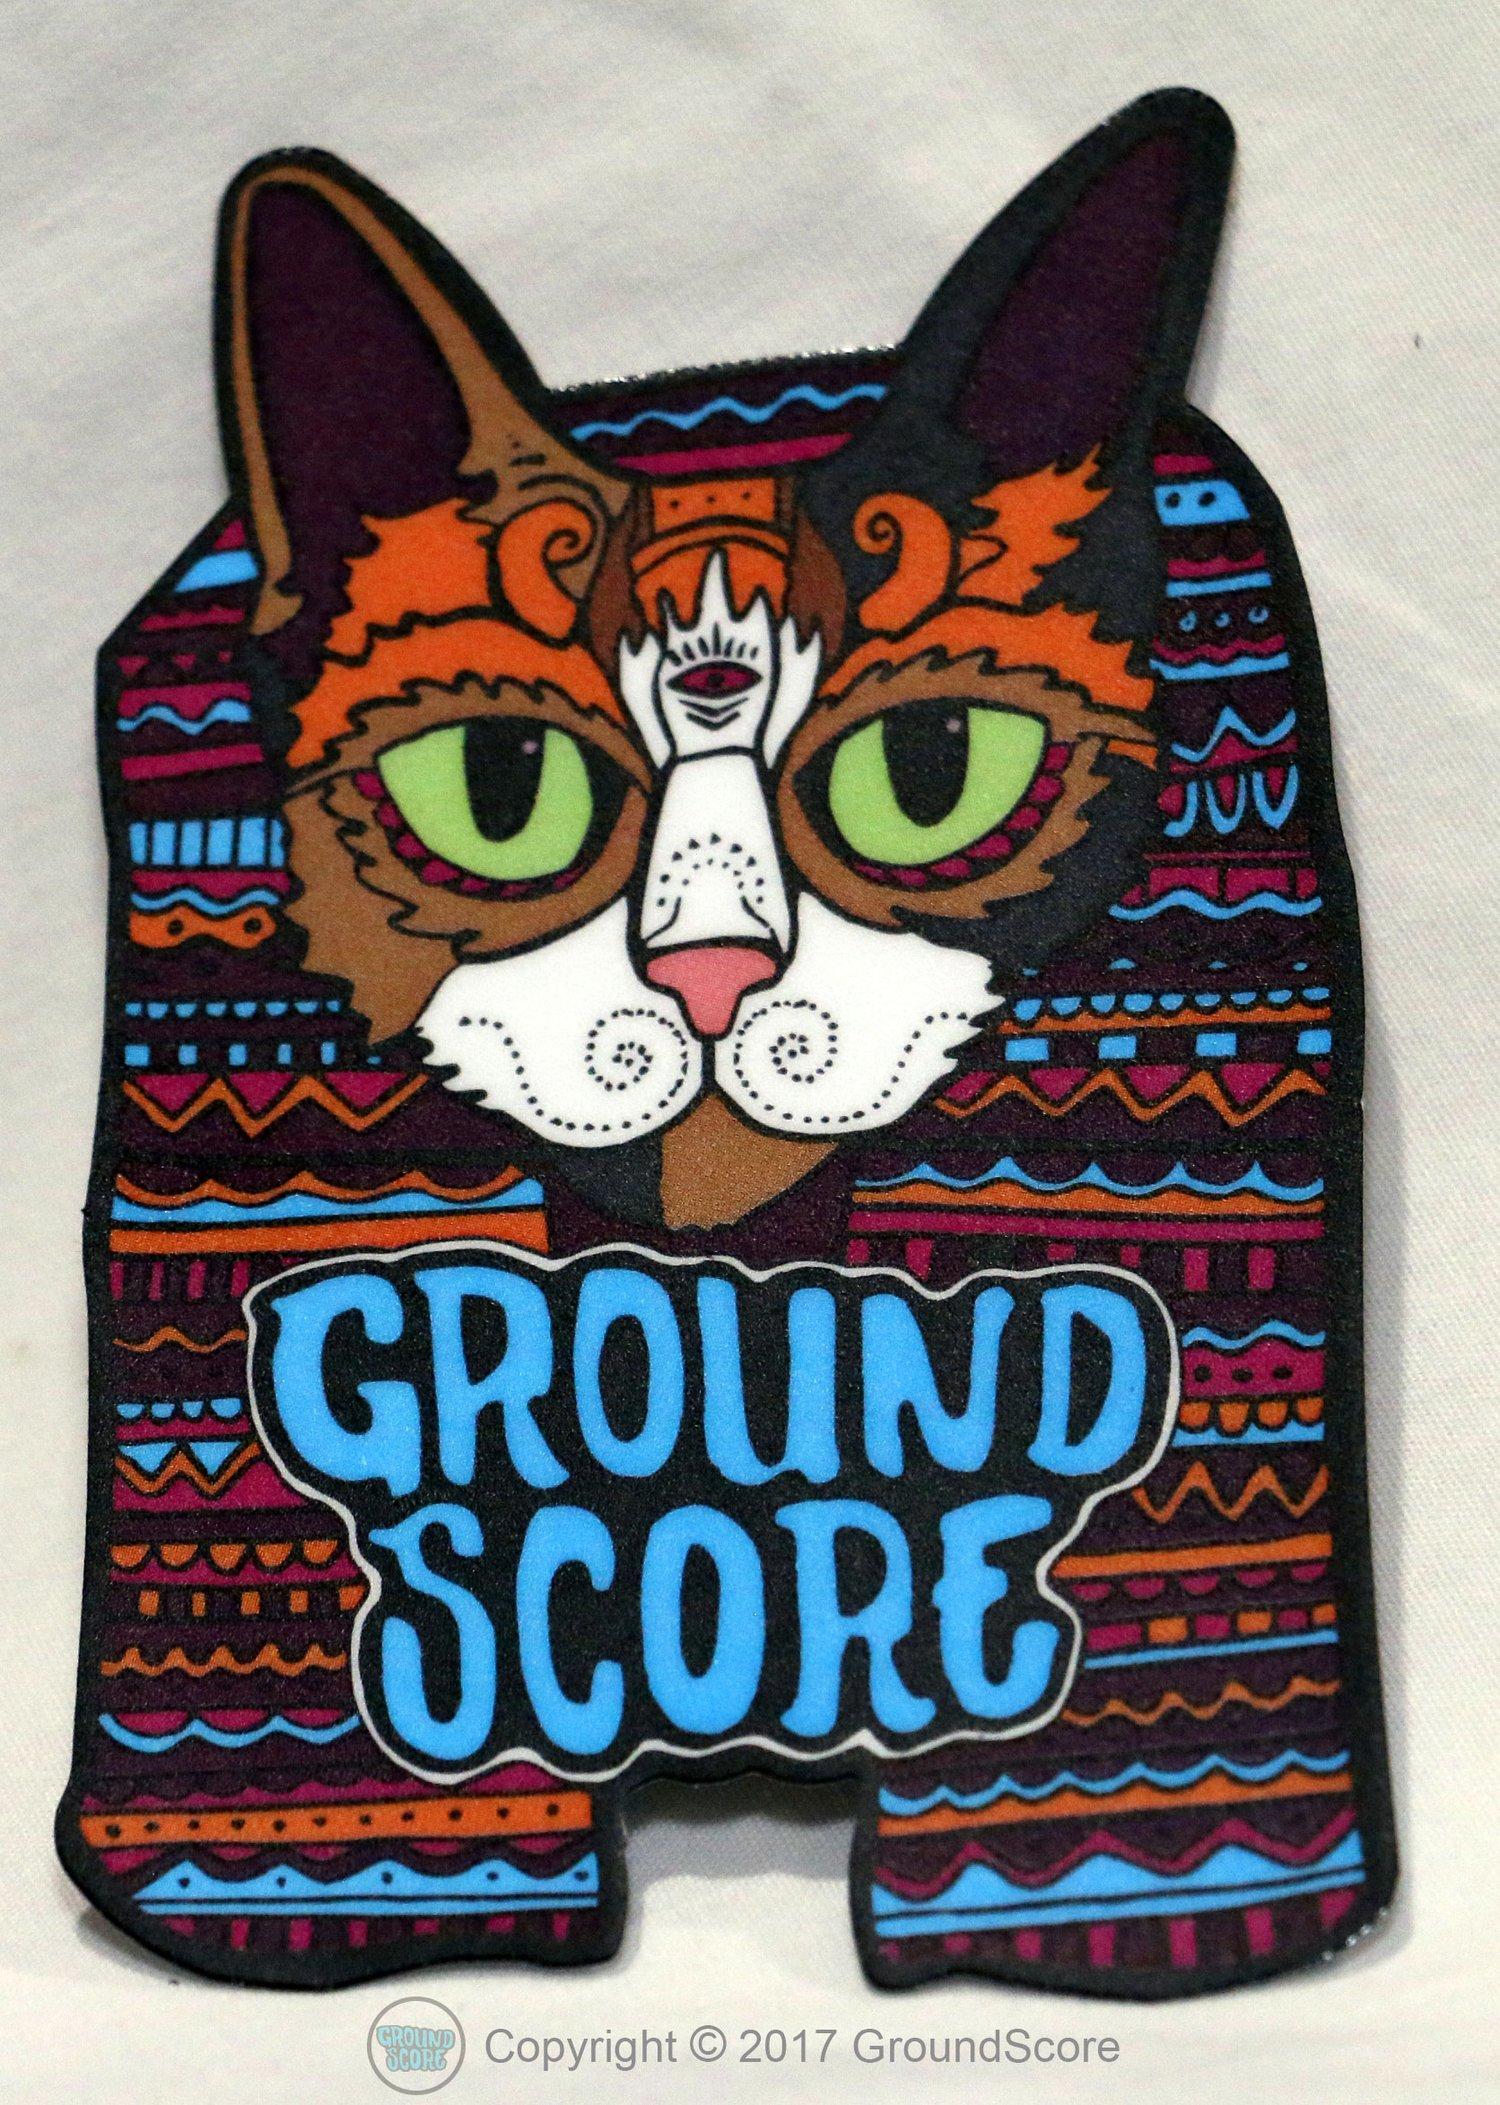 Ground Score Sticker (5 Pack Combo)